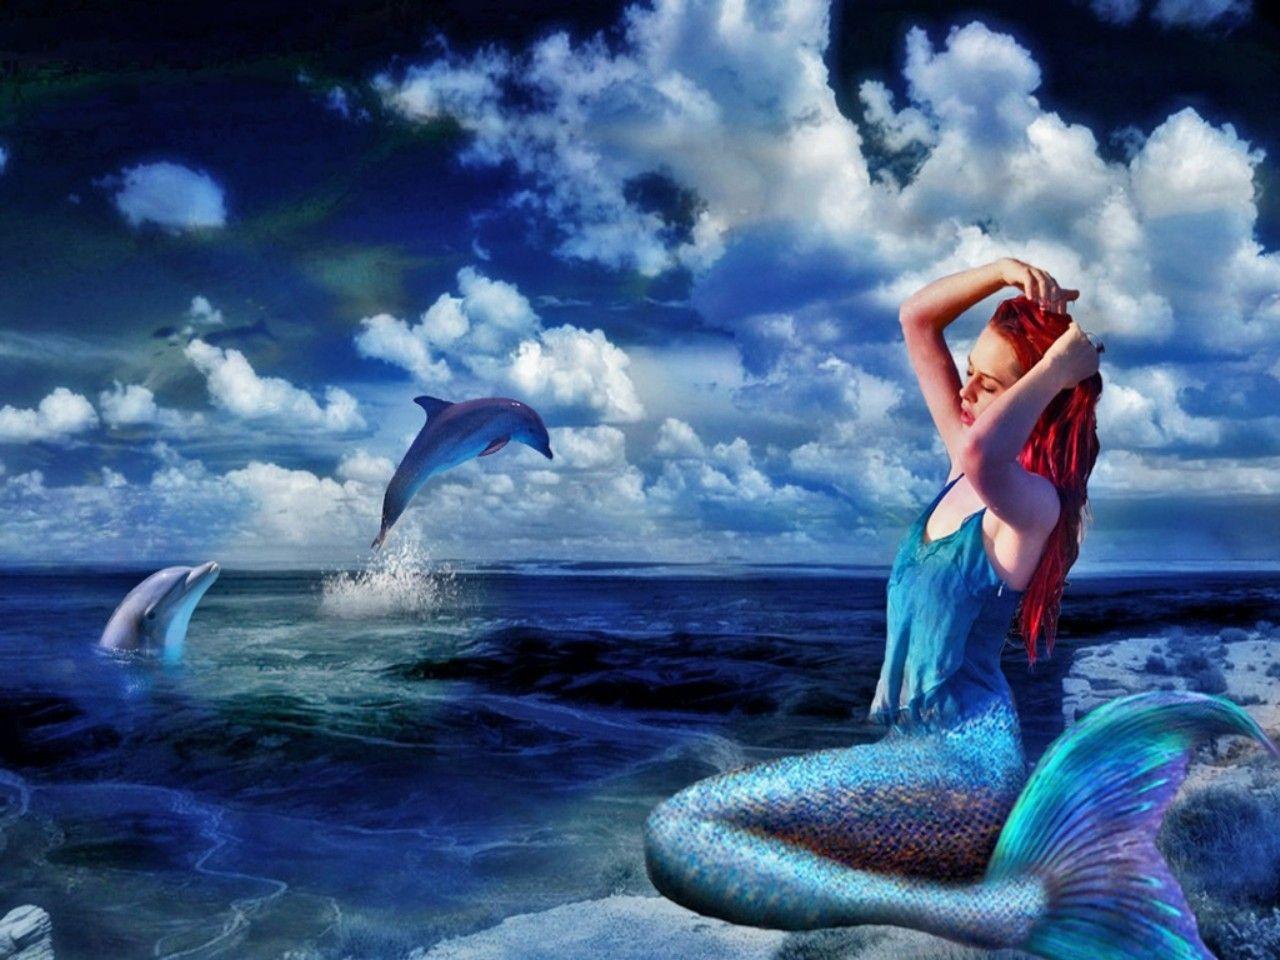 Mermaid Wallpaper Zedge Mermaid wallpaper backgrounds